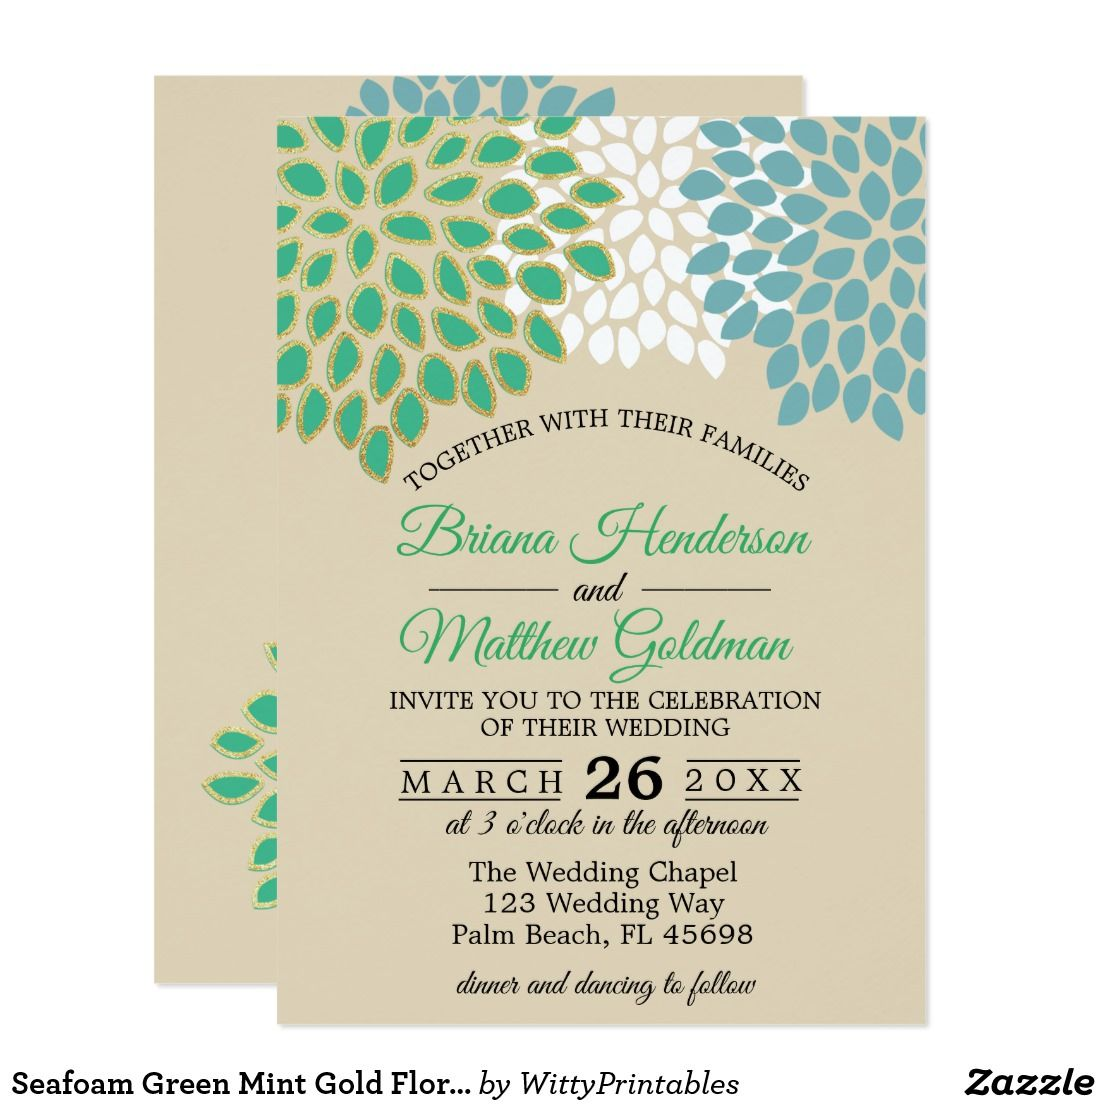 Seafoam Green Wedding Ideas: Seafoam Green Mint Gold Floral Wedding Invitation